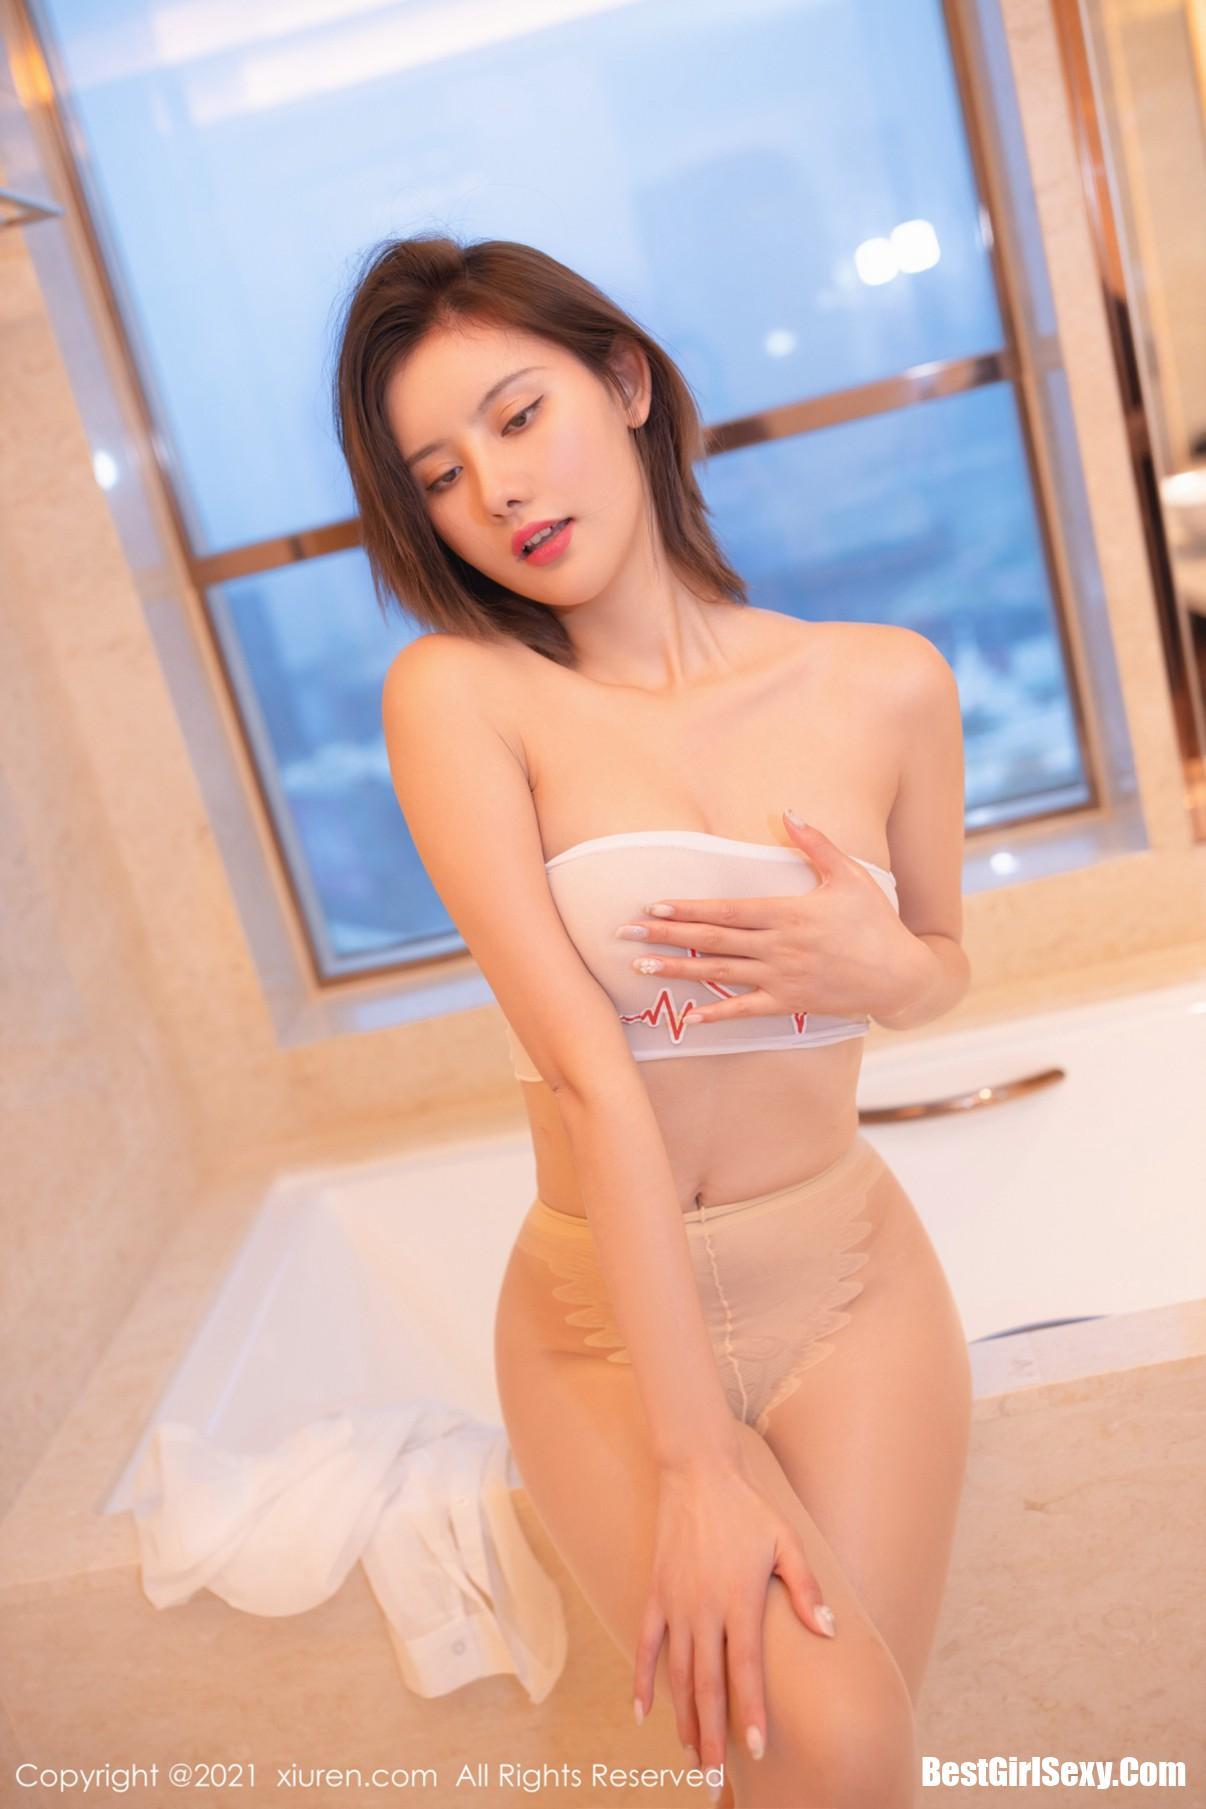 就是阿朱啊, XiuRen秀人网 No.3427 Jiu Shi A Zhu, XiuRen秀人网 No.3427, Jiu Shi A Zhu